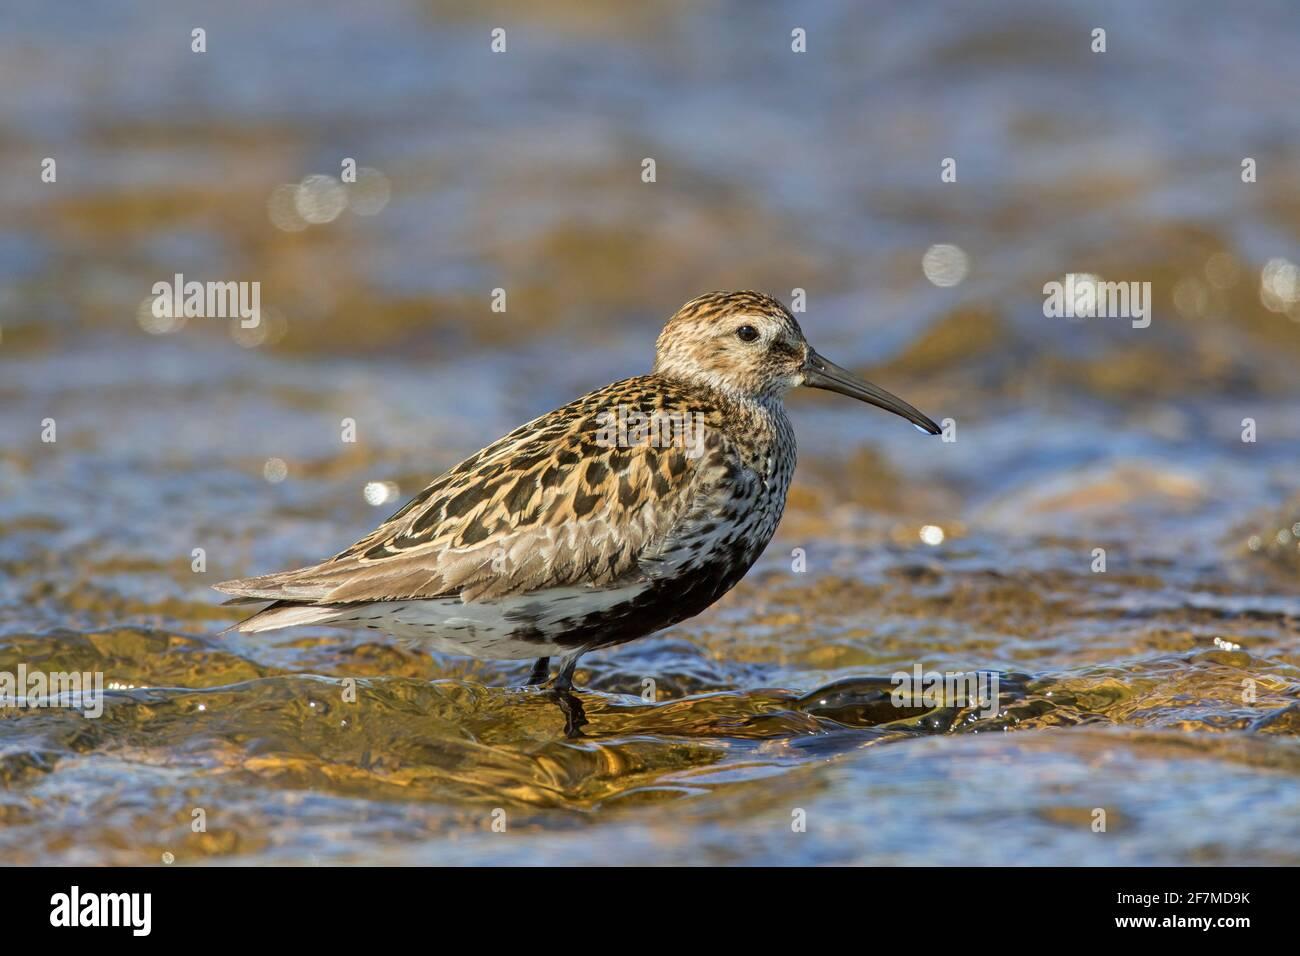 Dunlin (Calidris alpina schinzii) dans la reproduction de plumage en eau peu profonde en été, Islande Banque D'Images